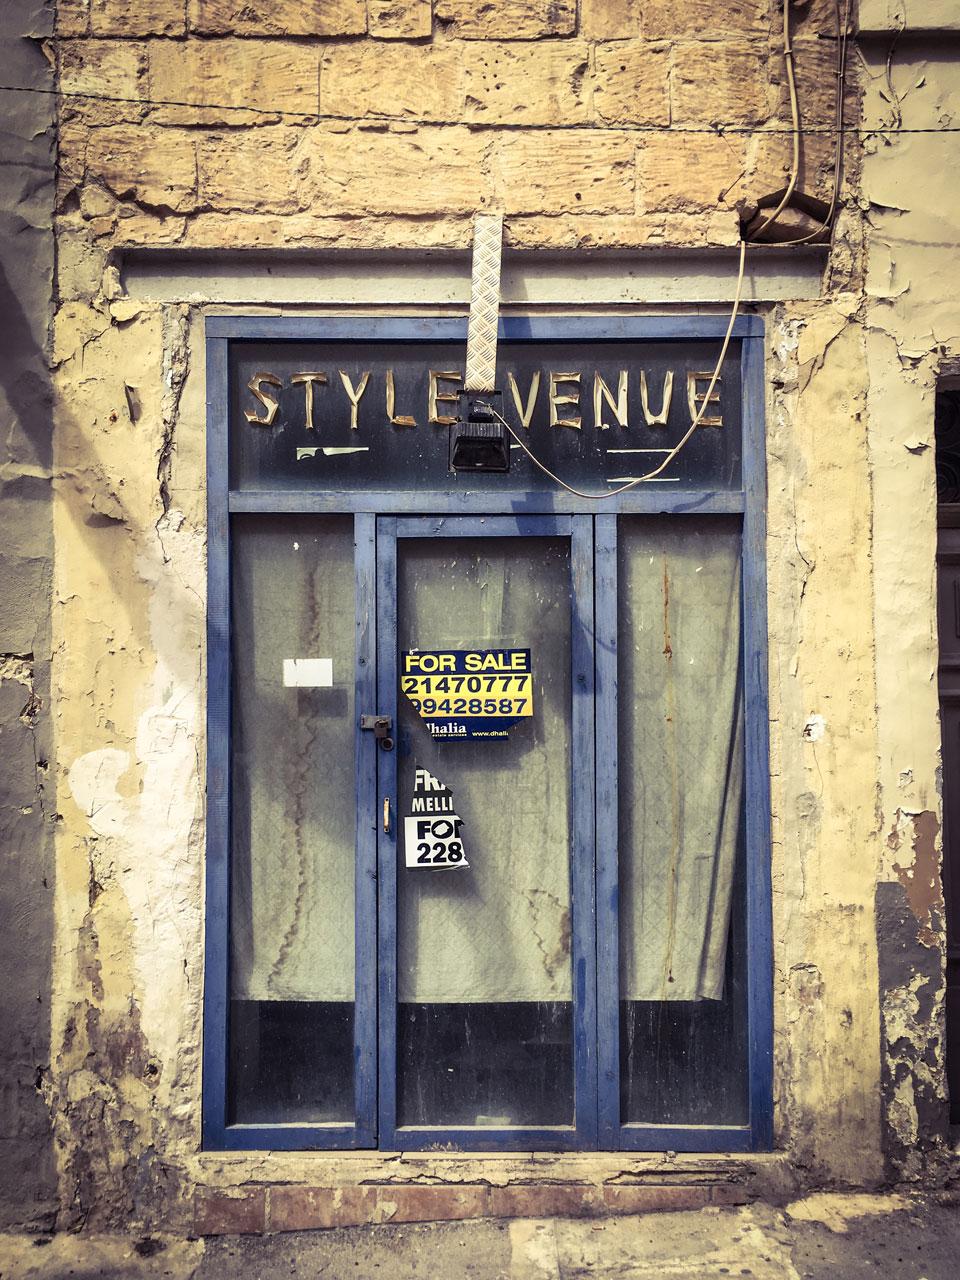 disappearingMalta - Style Venue, Triq il-Knisja I-Qadima, Birkirkara, Malta - vintage storefront ©Helen Jones-Florio photography prints